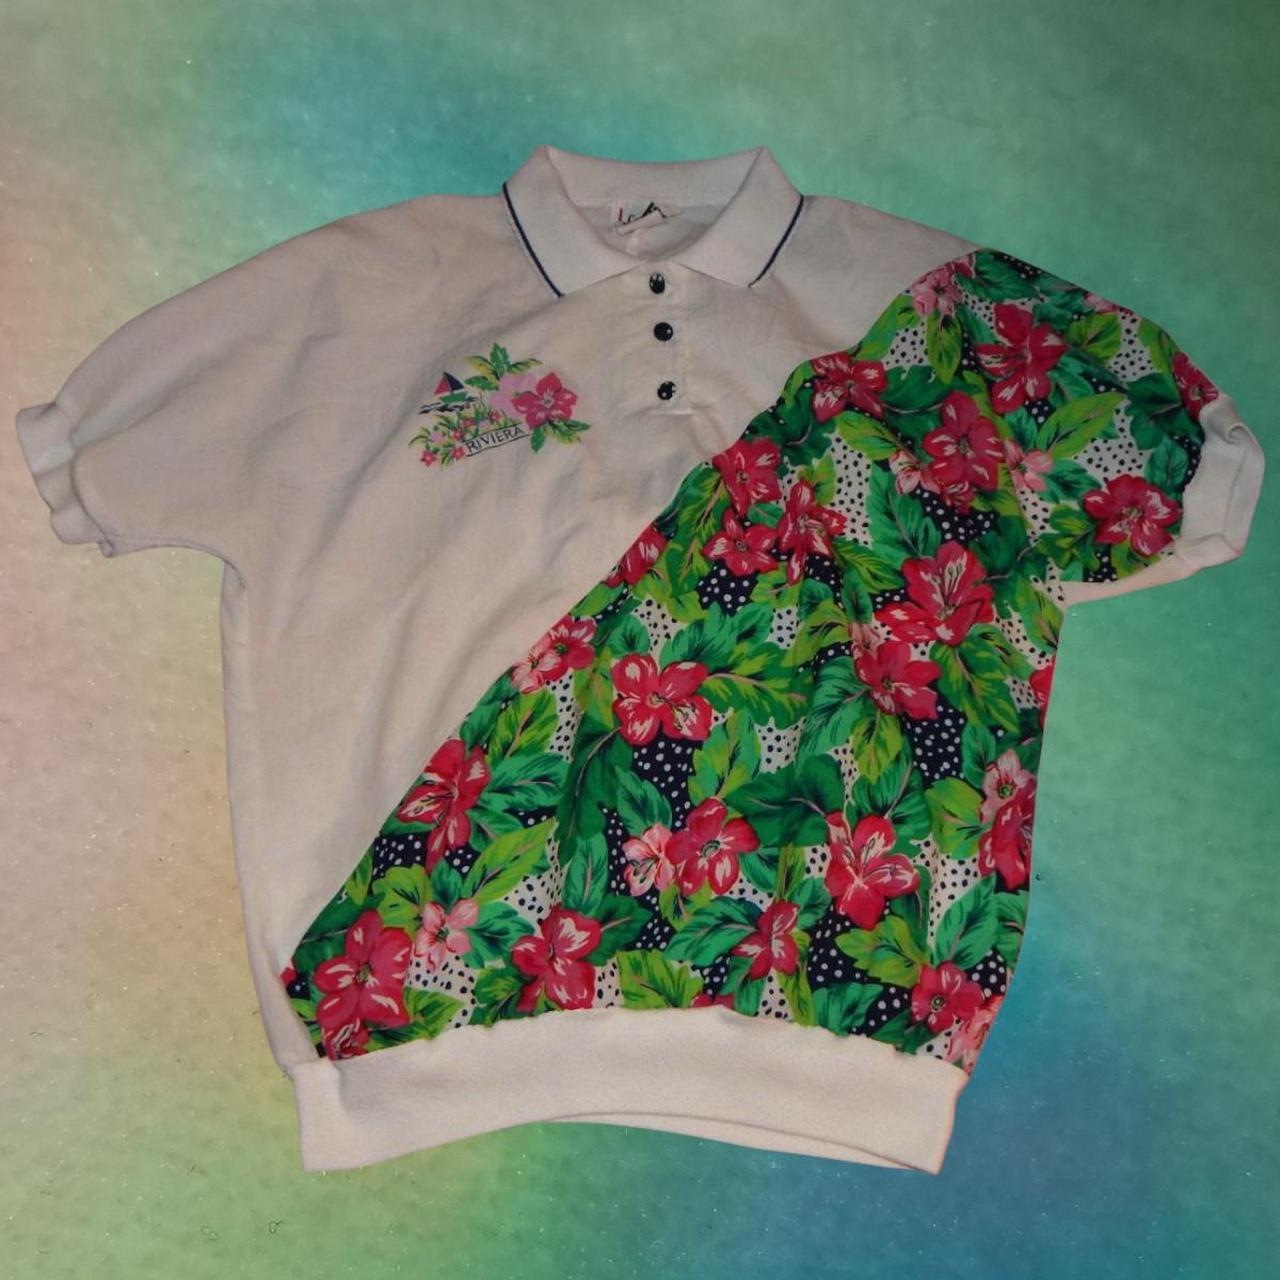 Product Image 1 - Cricket Lane Floral Colorblock Button